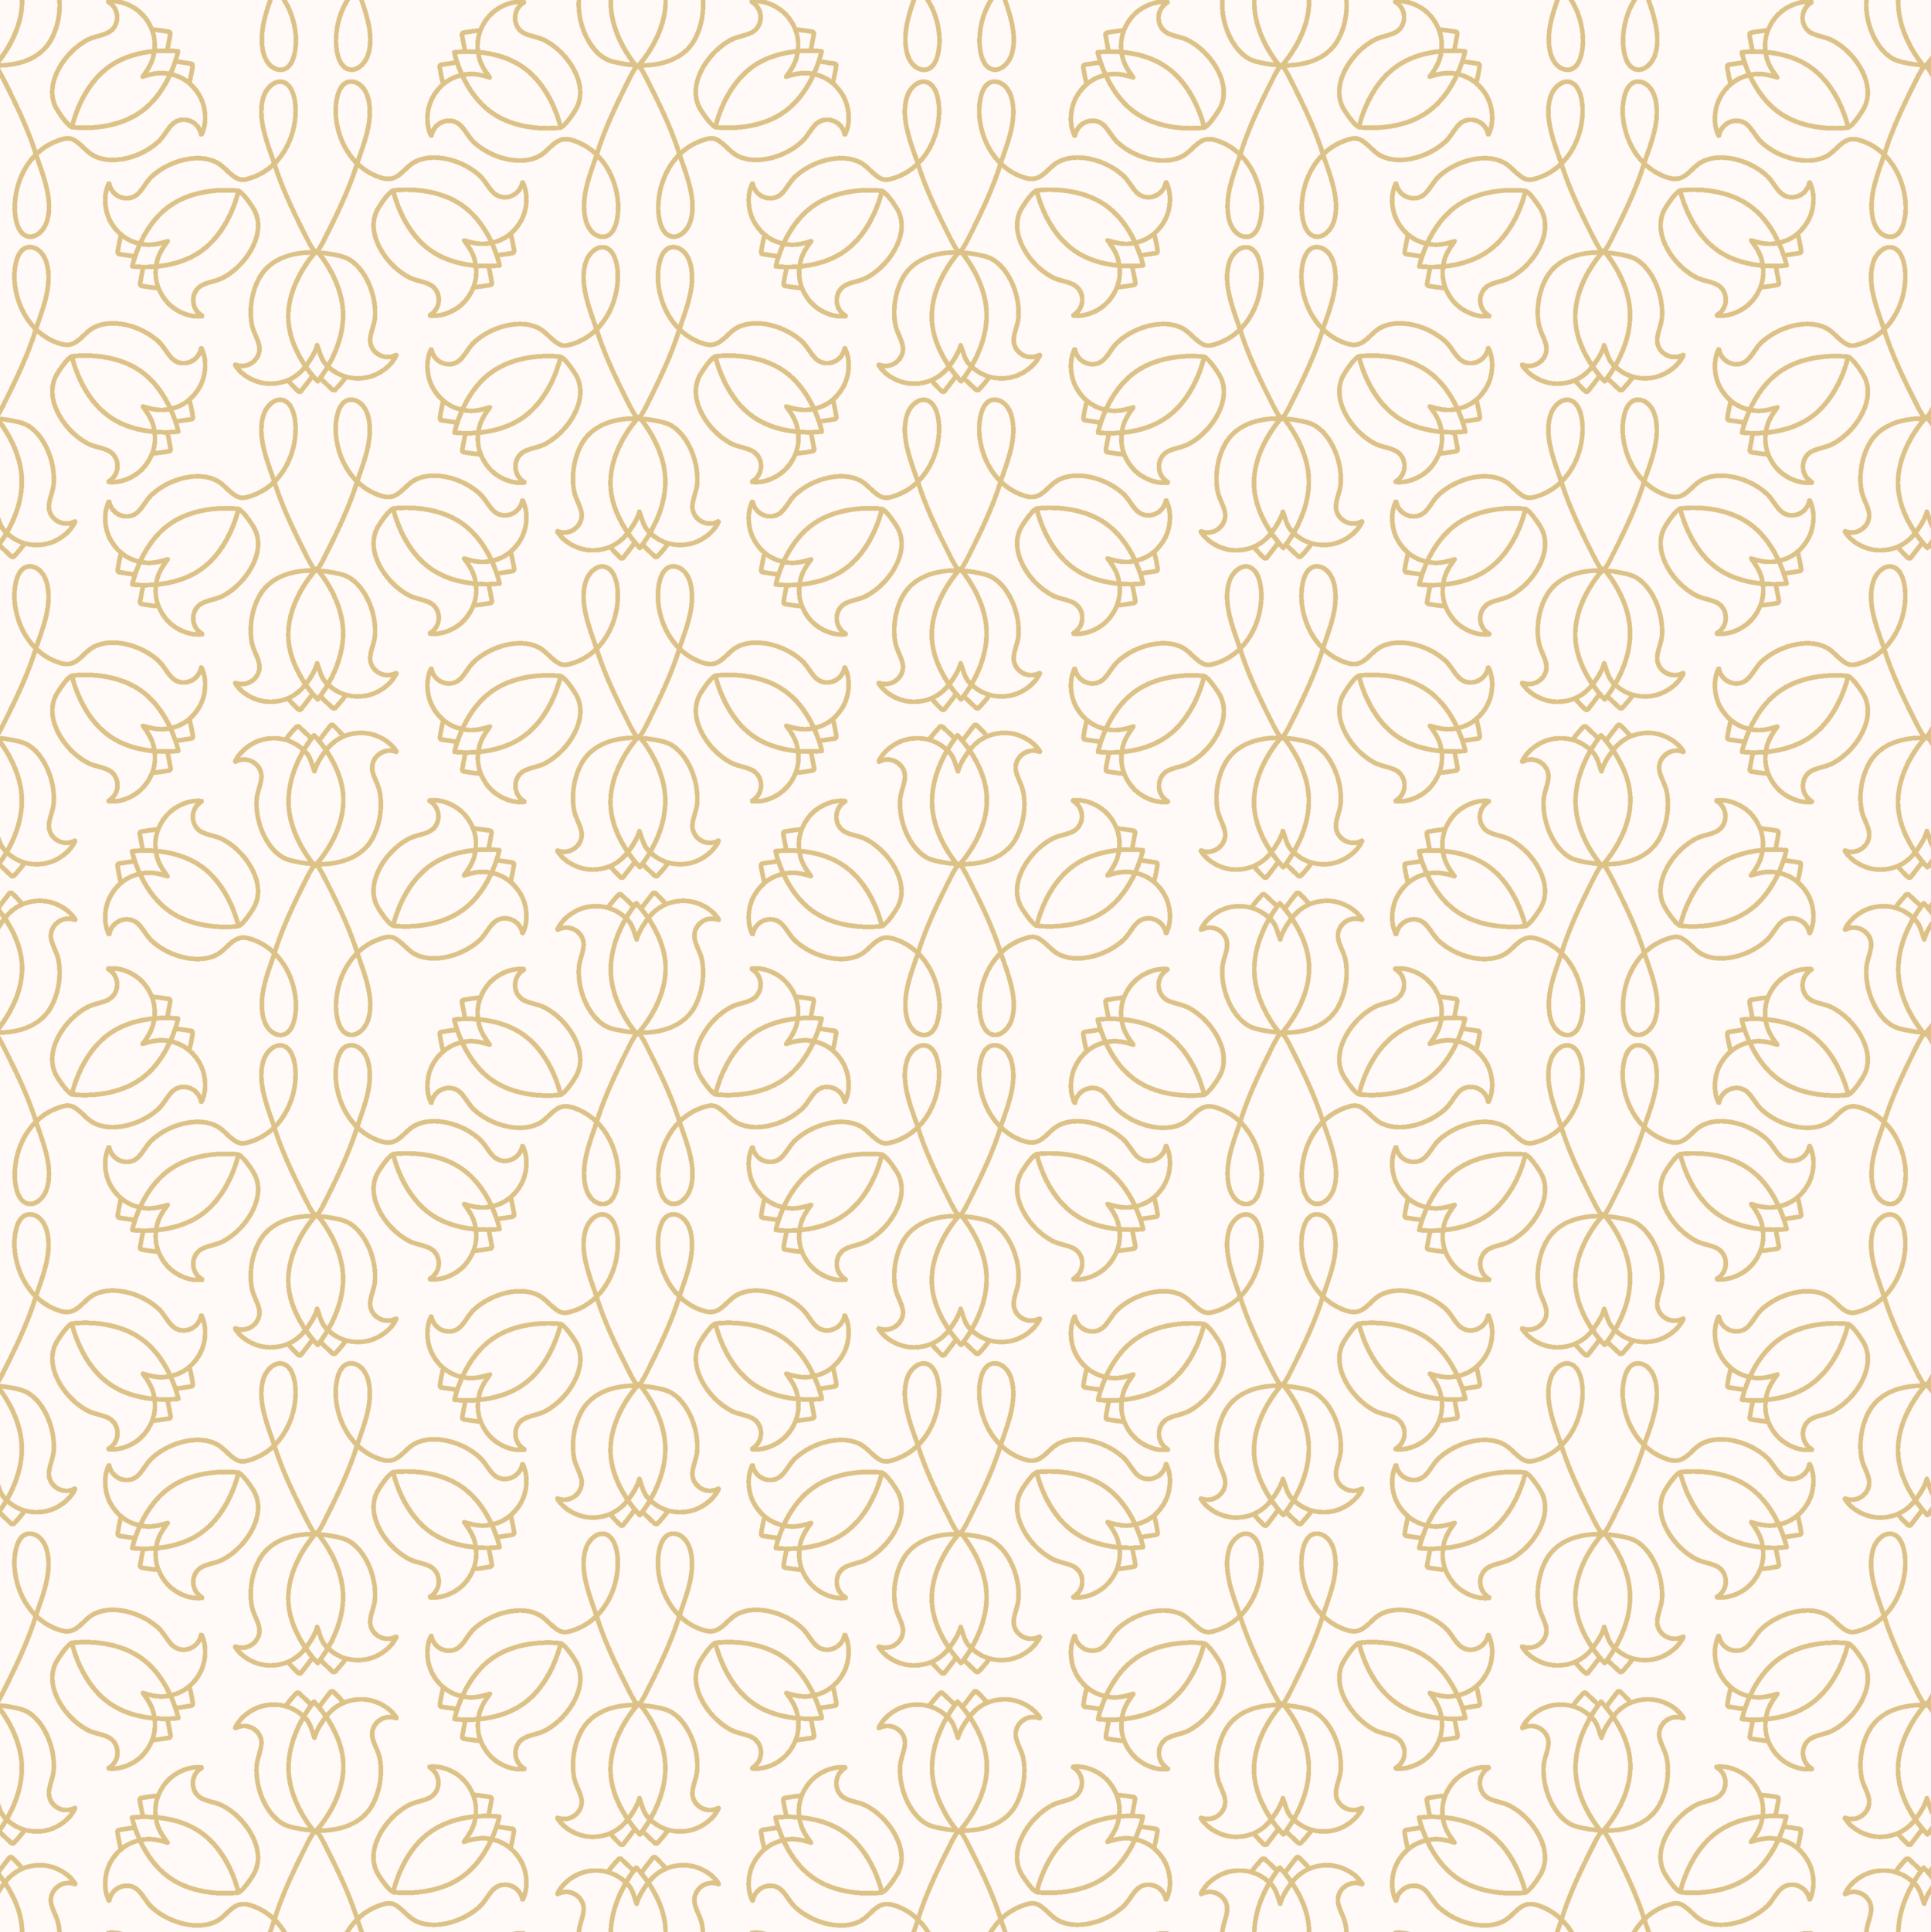 OliveCoPatterns-03 (1).png